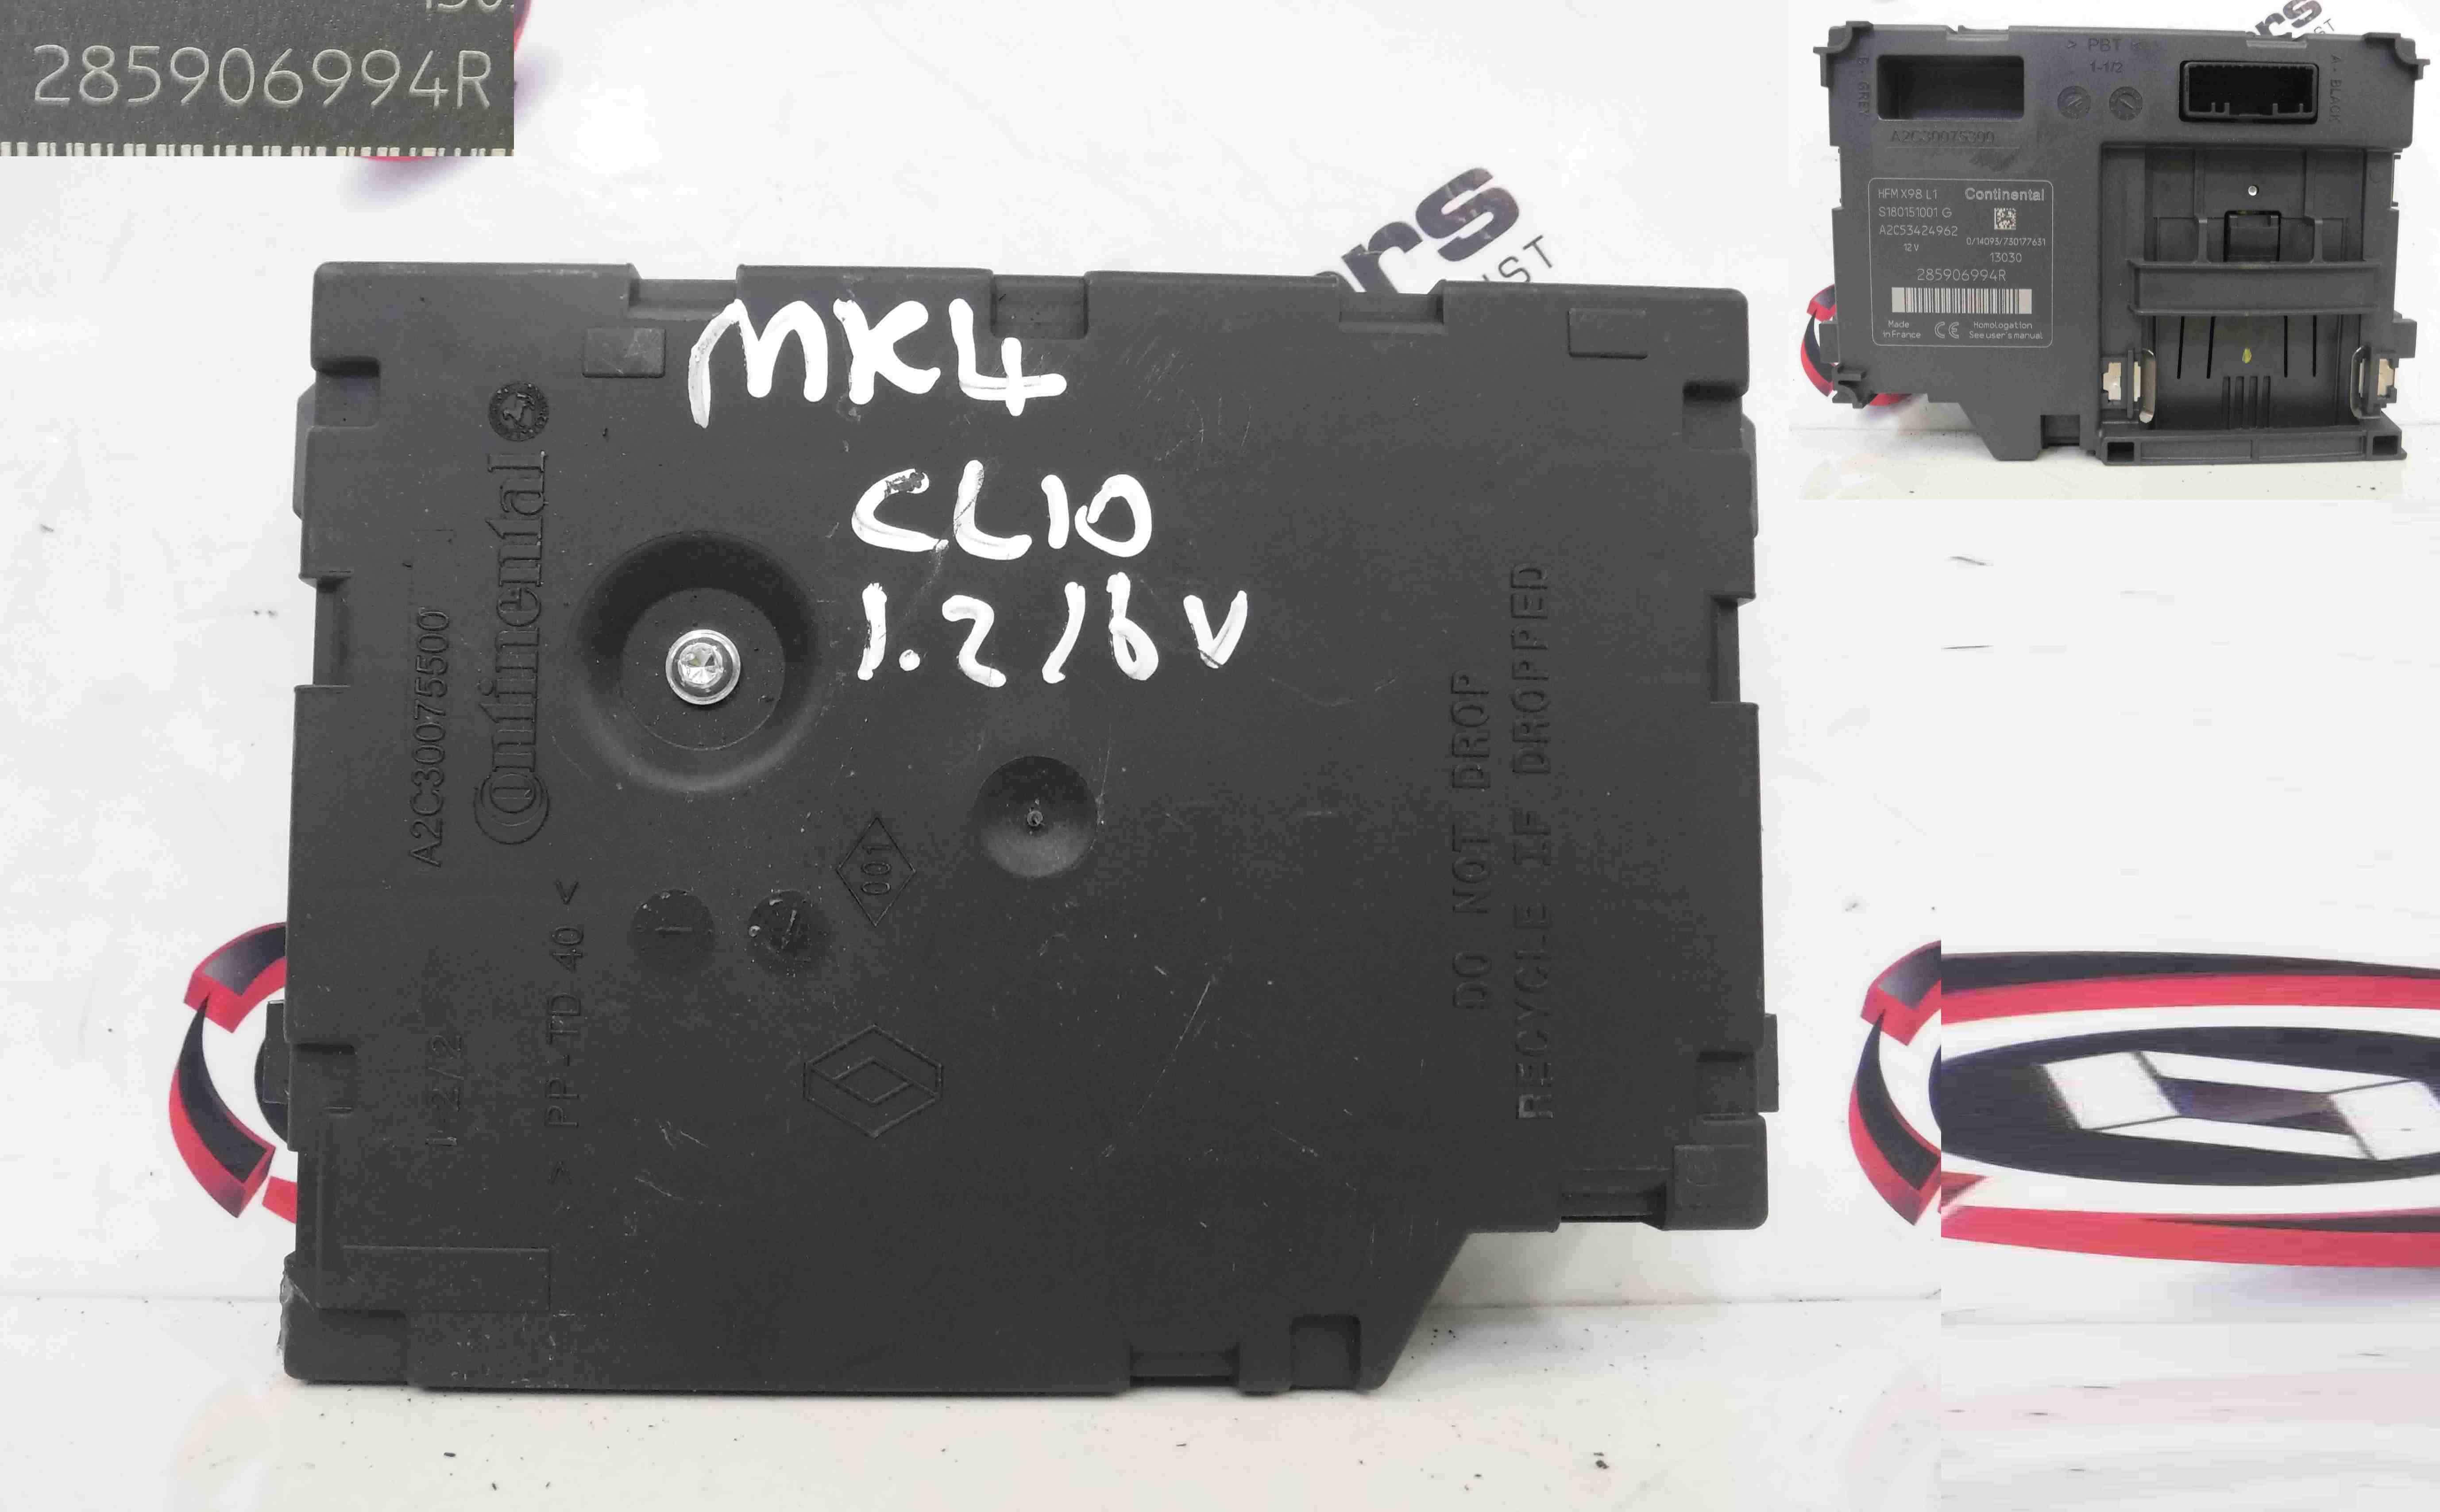 Renault Clio MK4 2013-2015 Ignition Key Card Reader 285906994R